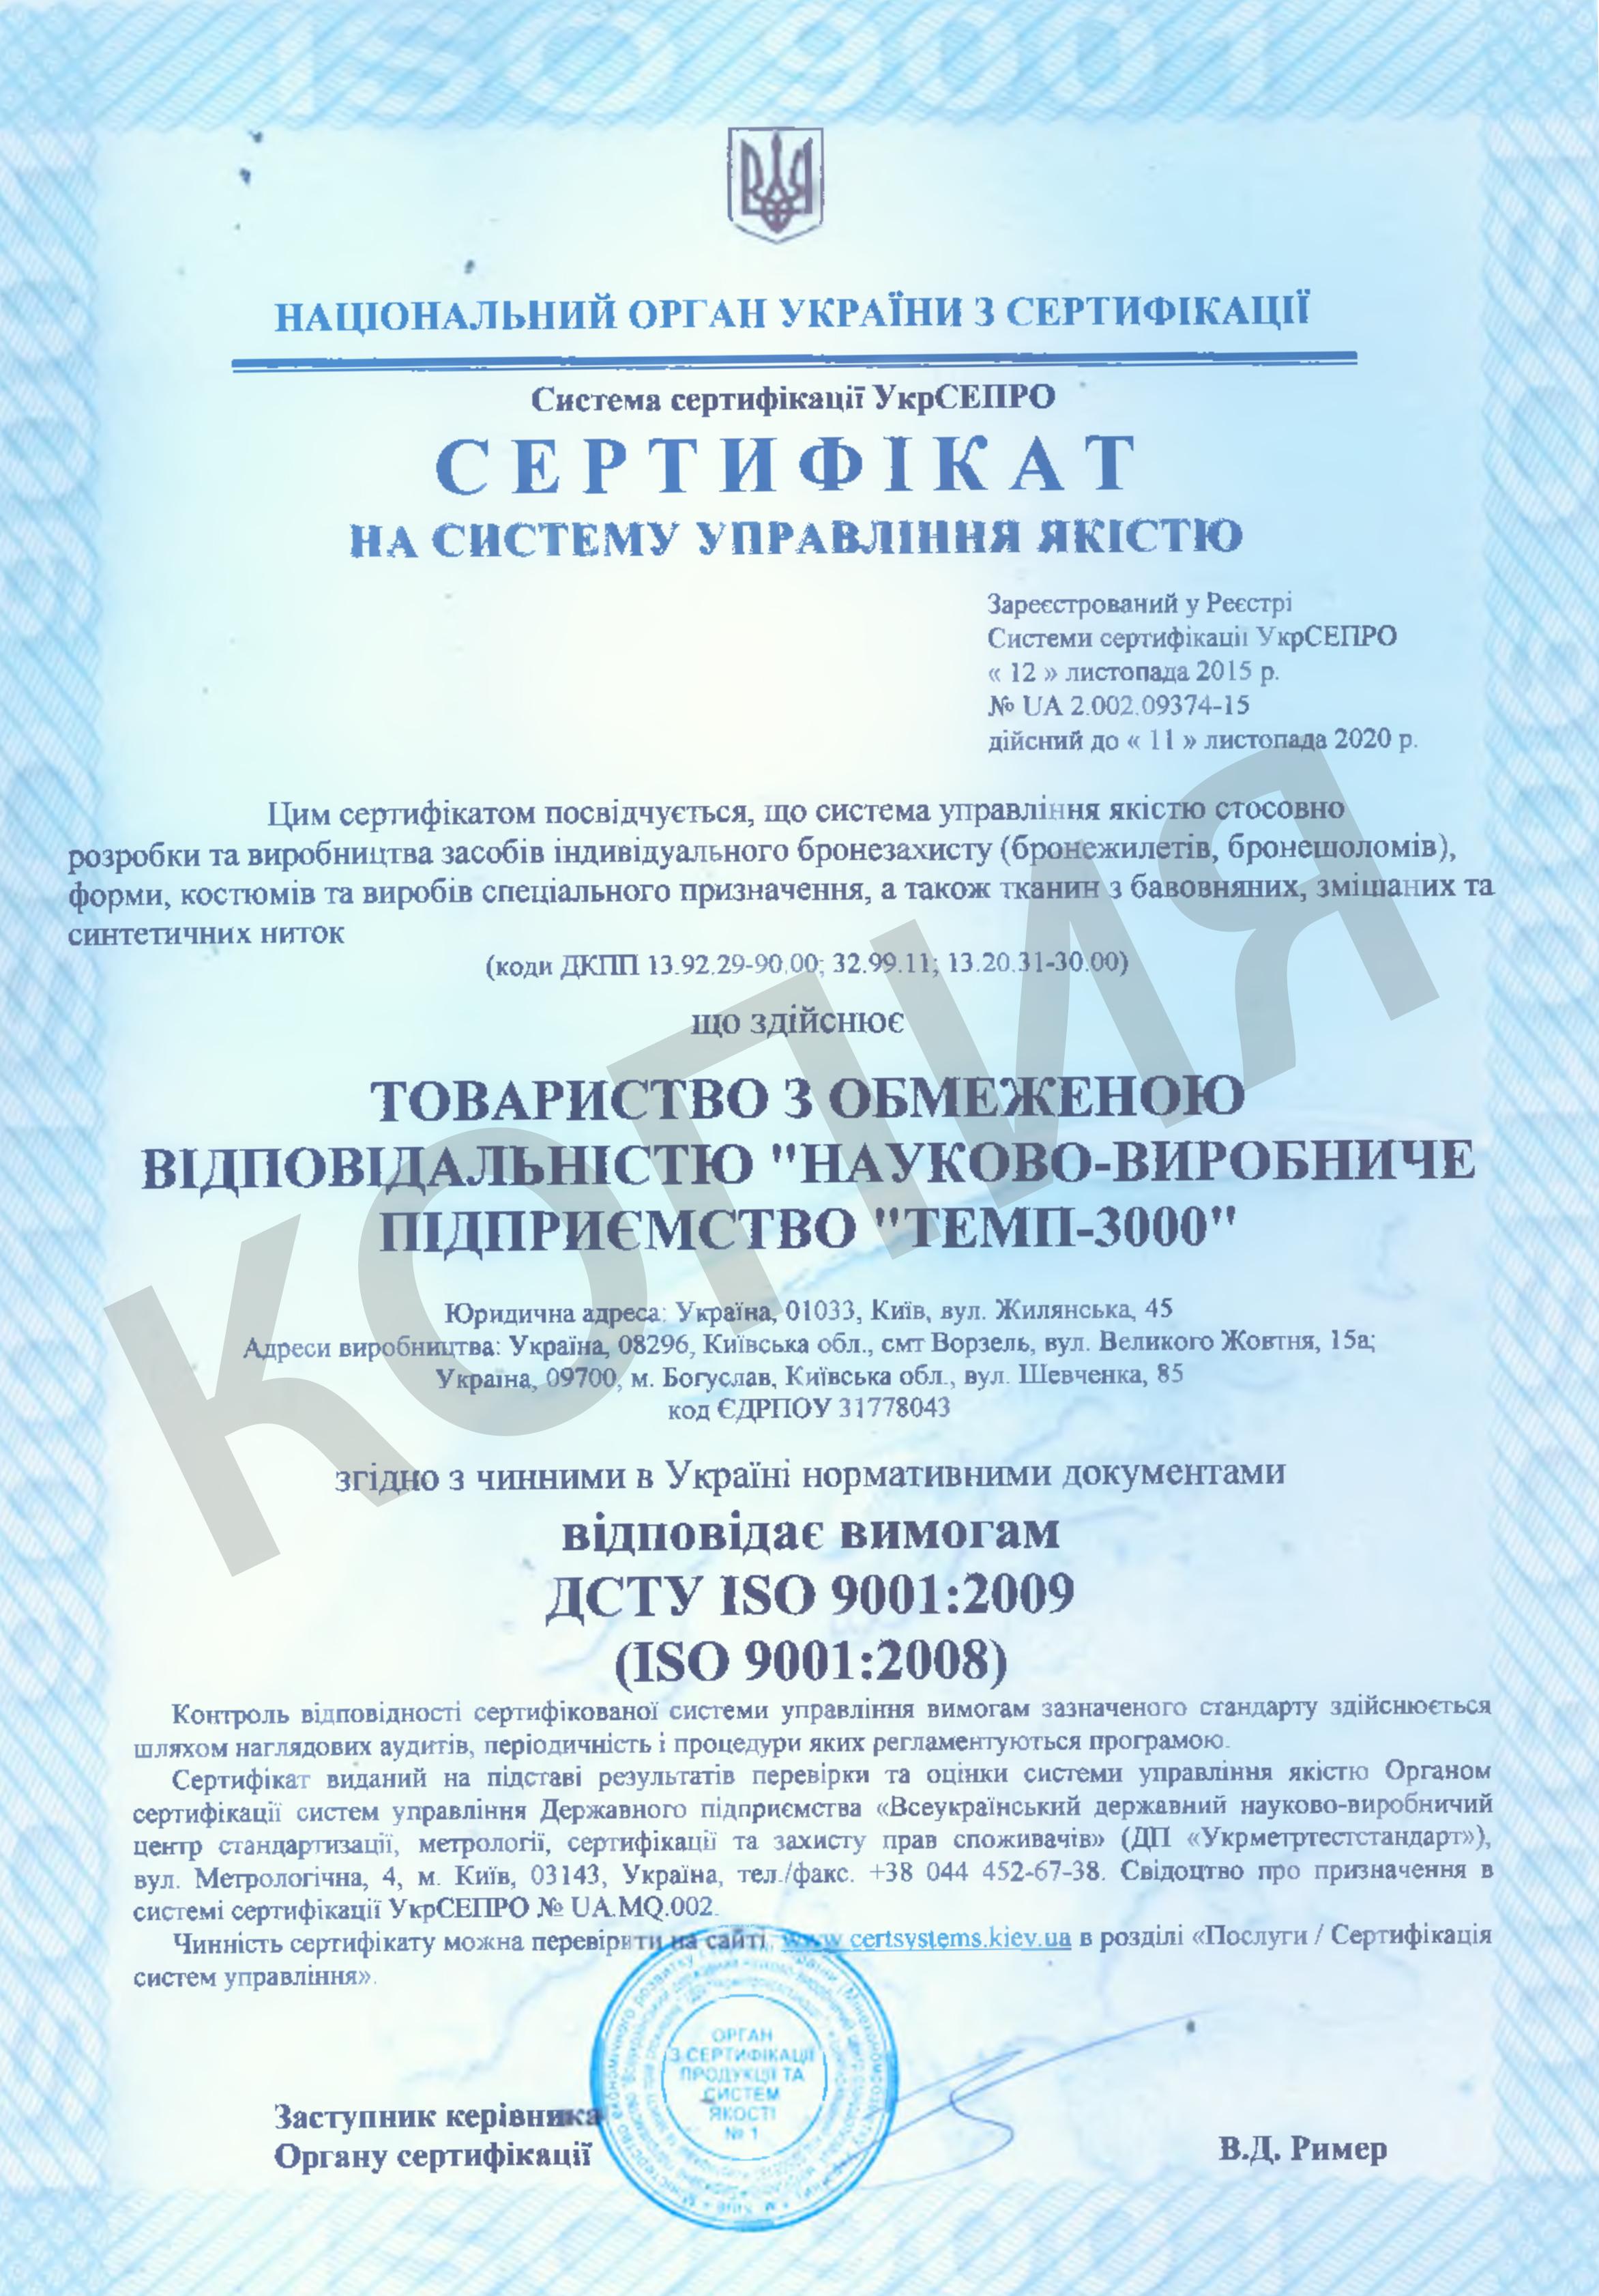 НПП ТЕМП-3000, ООО